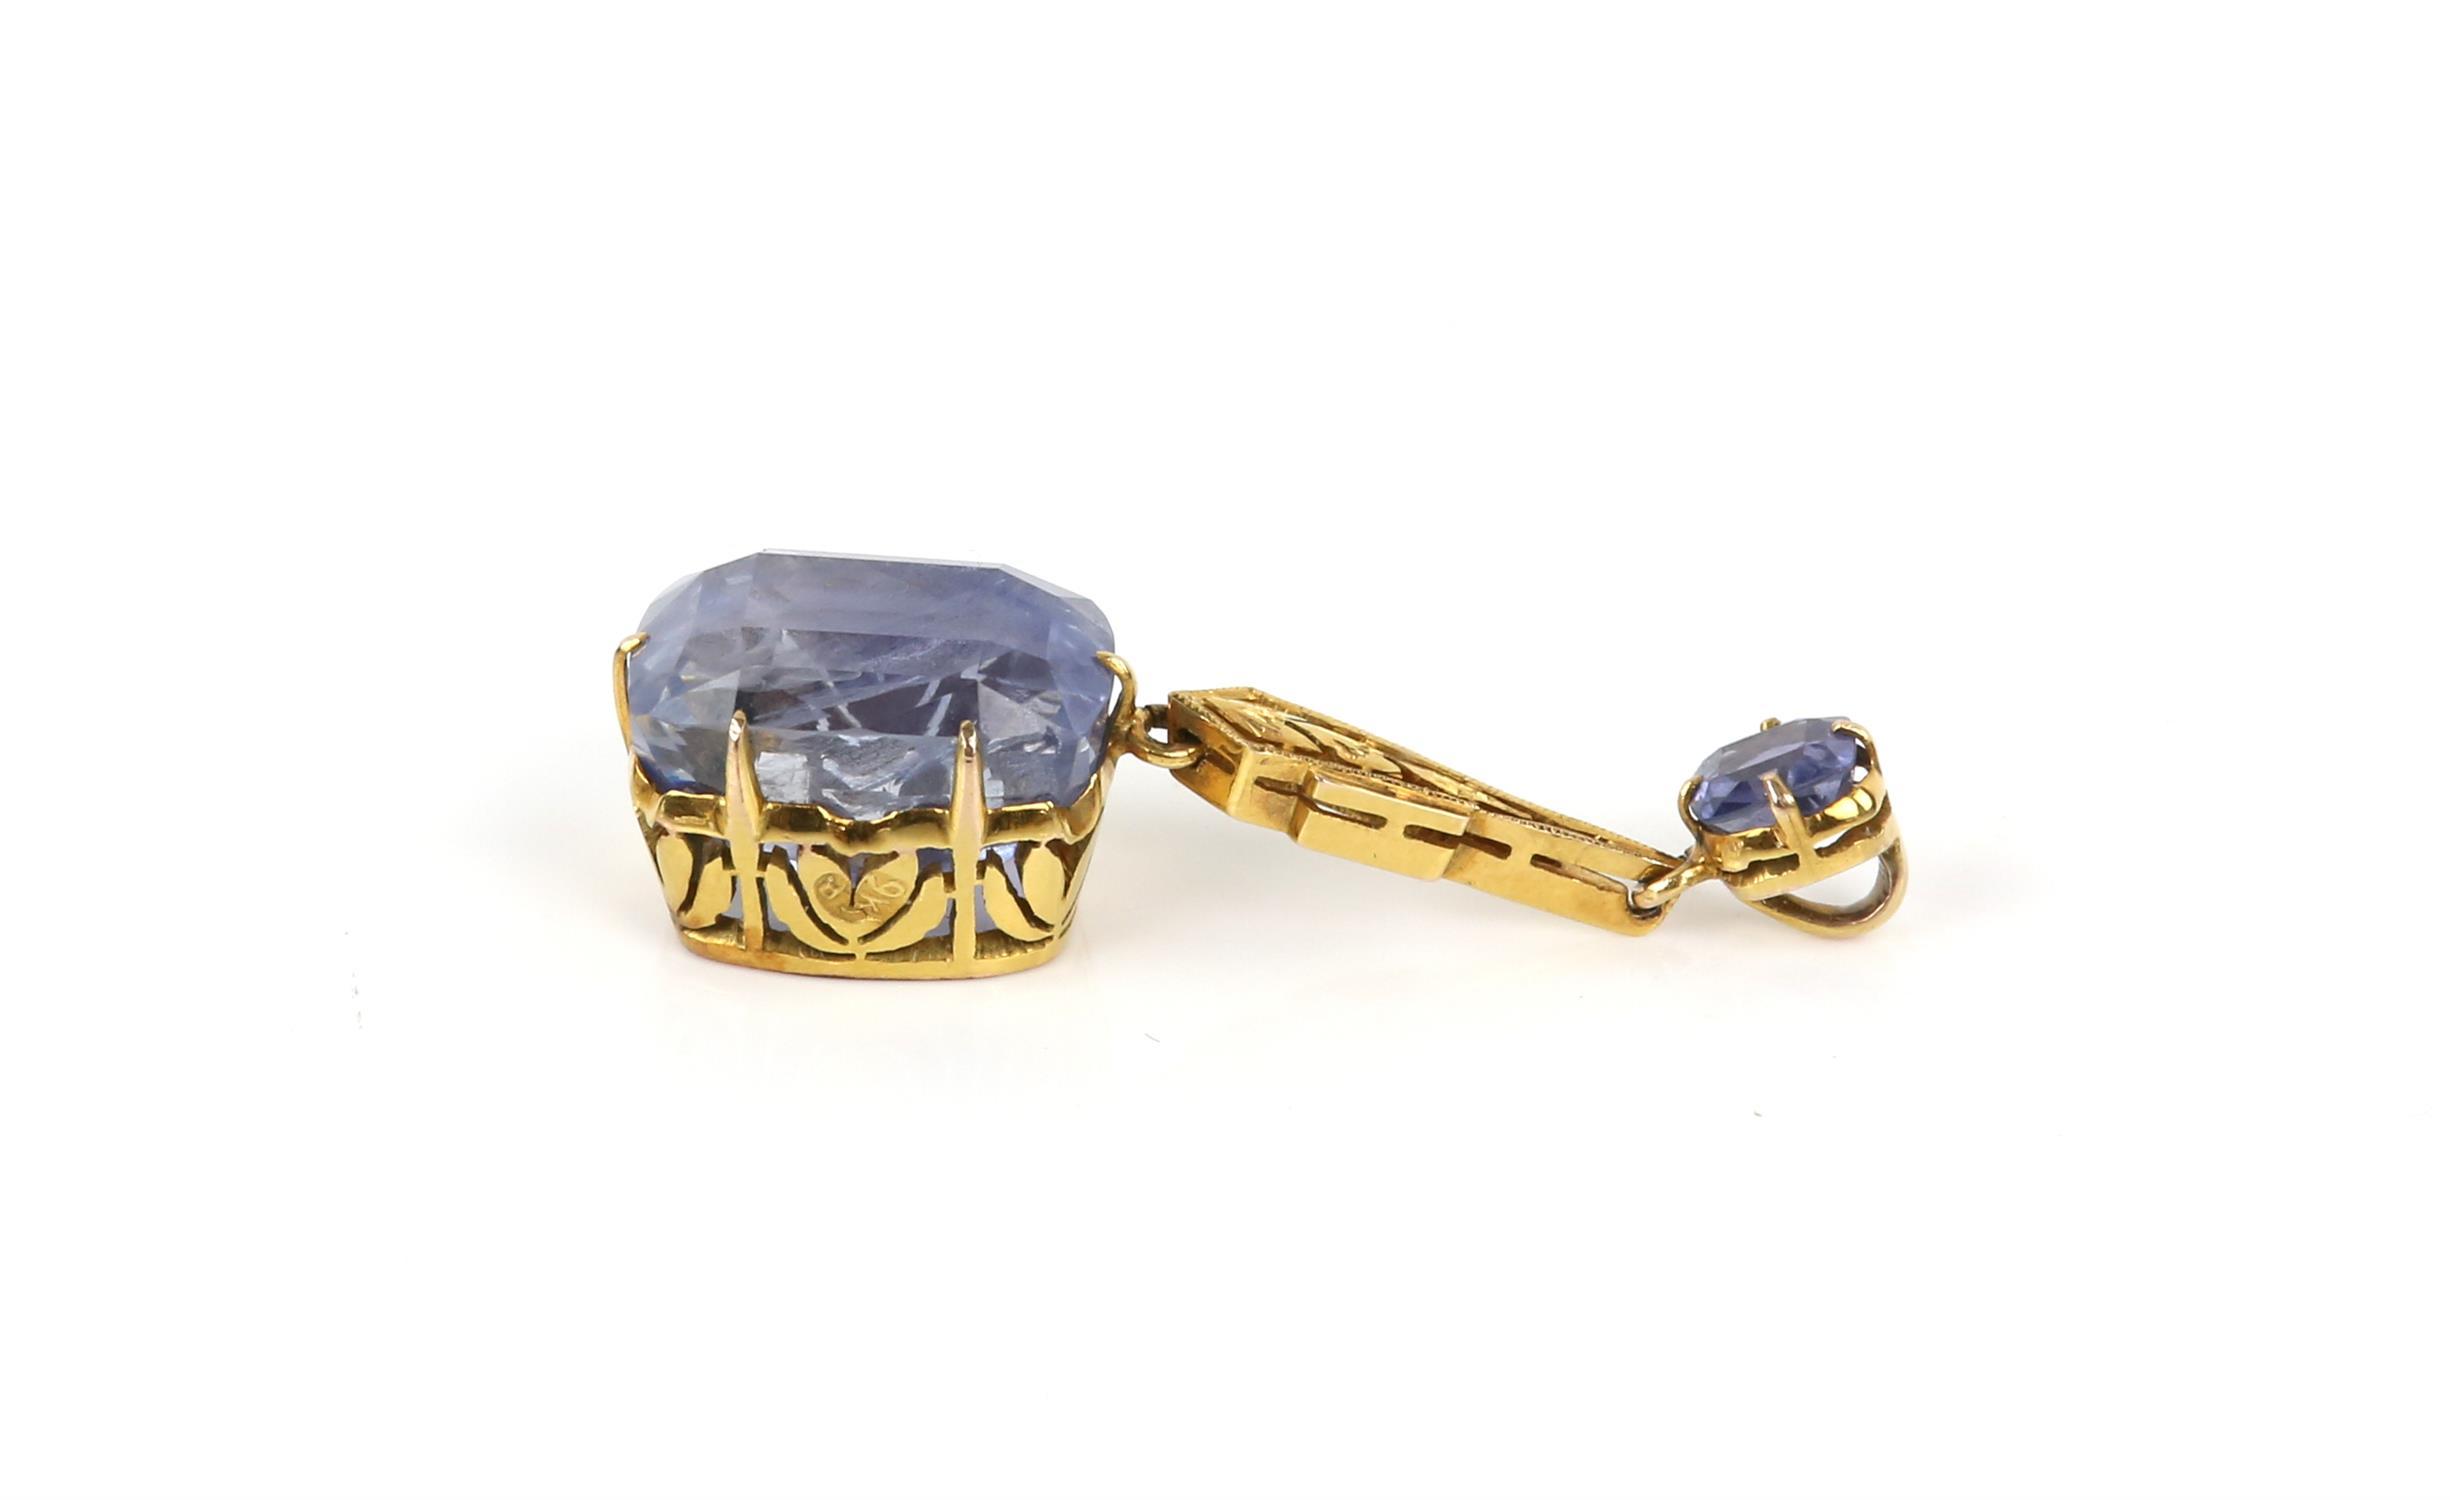 Sapphire drop pendant, principal light blue sapphire, estimated weight 12.99 carats, - Image 7 of 8